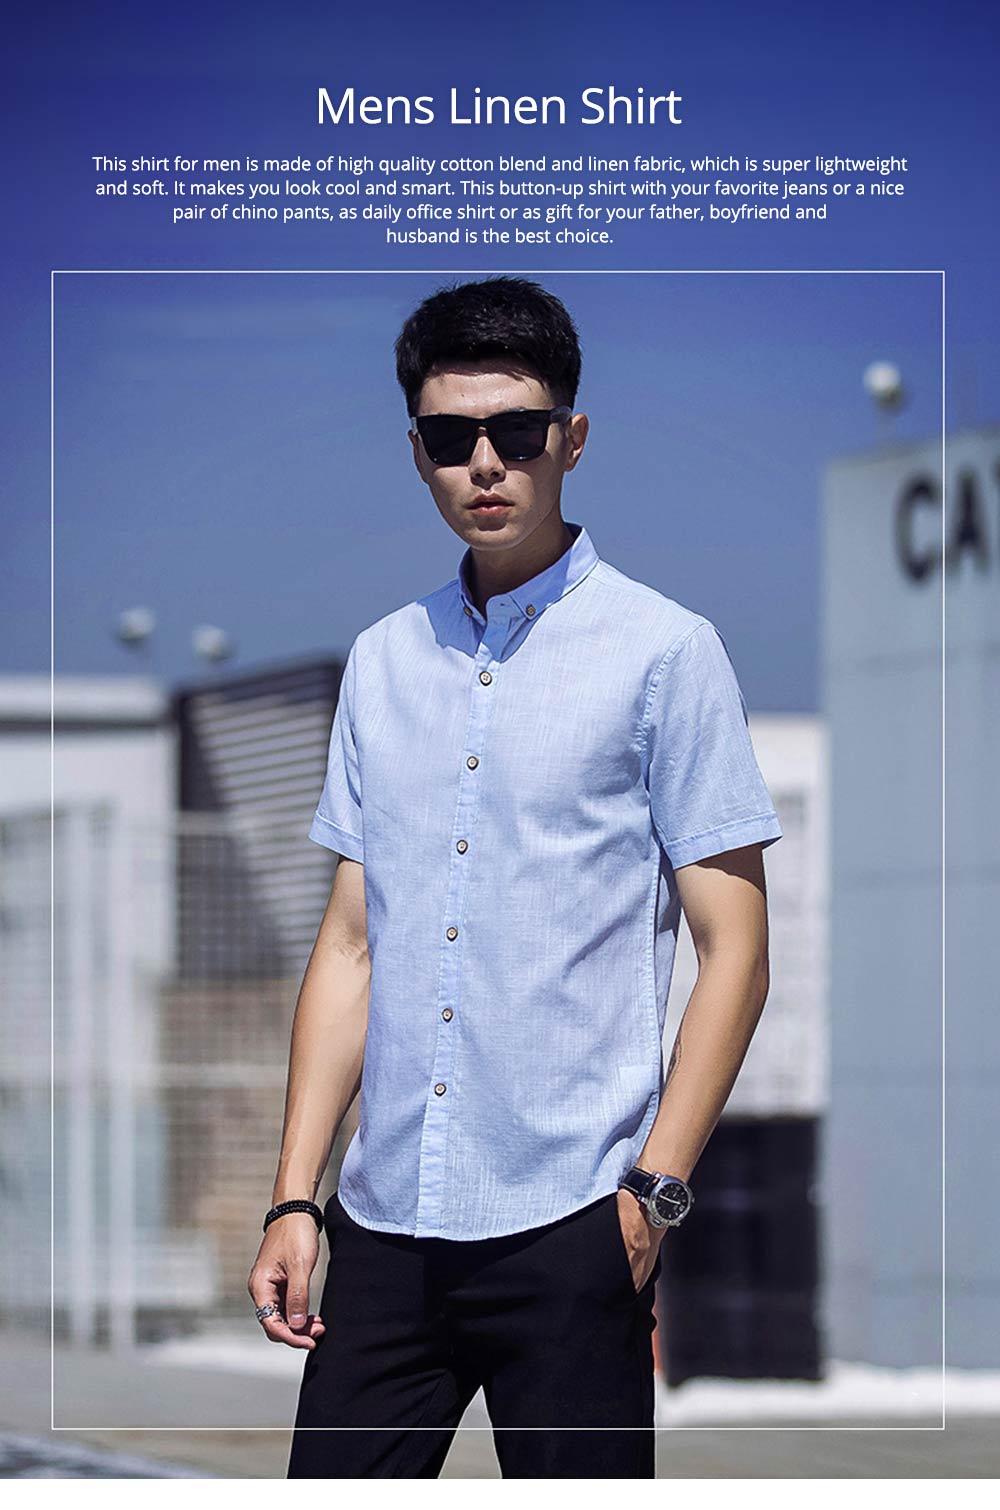 Mens Linen Shirt Short Sleeve Banded Collar Casual Shirts Regular Fit Button Down T-shirts 0